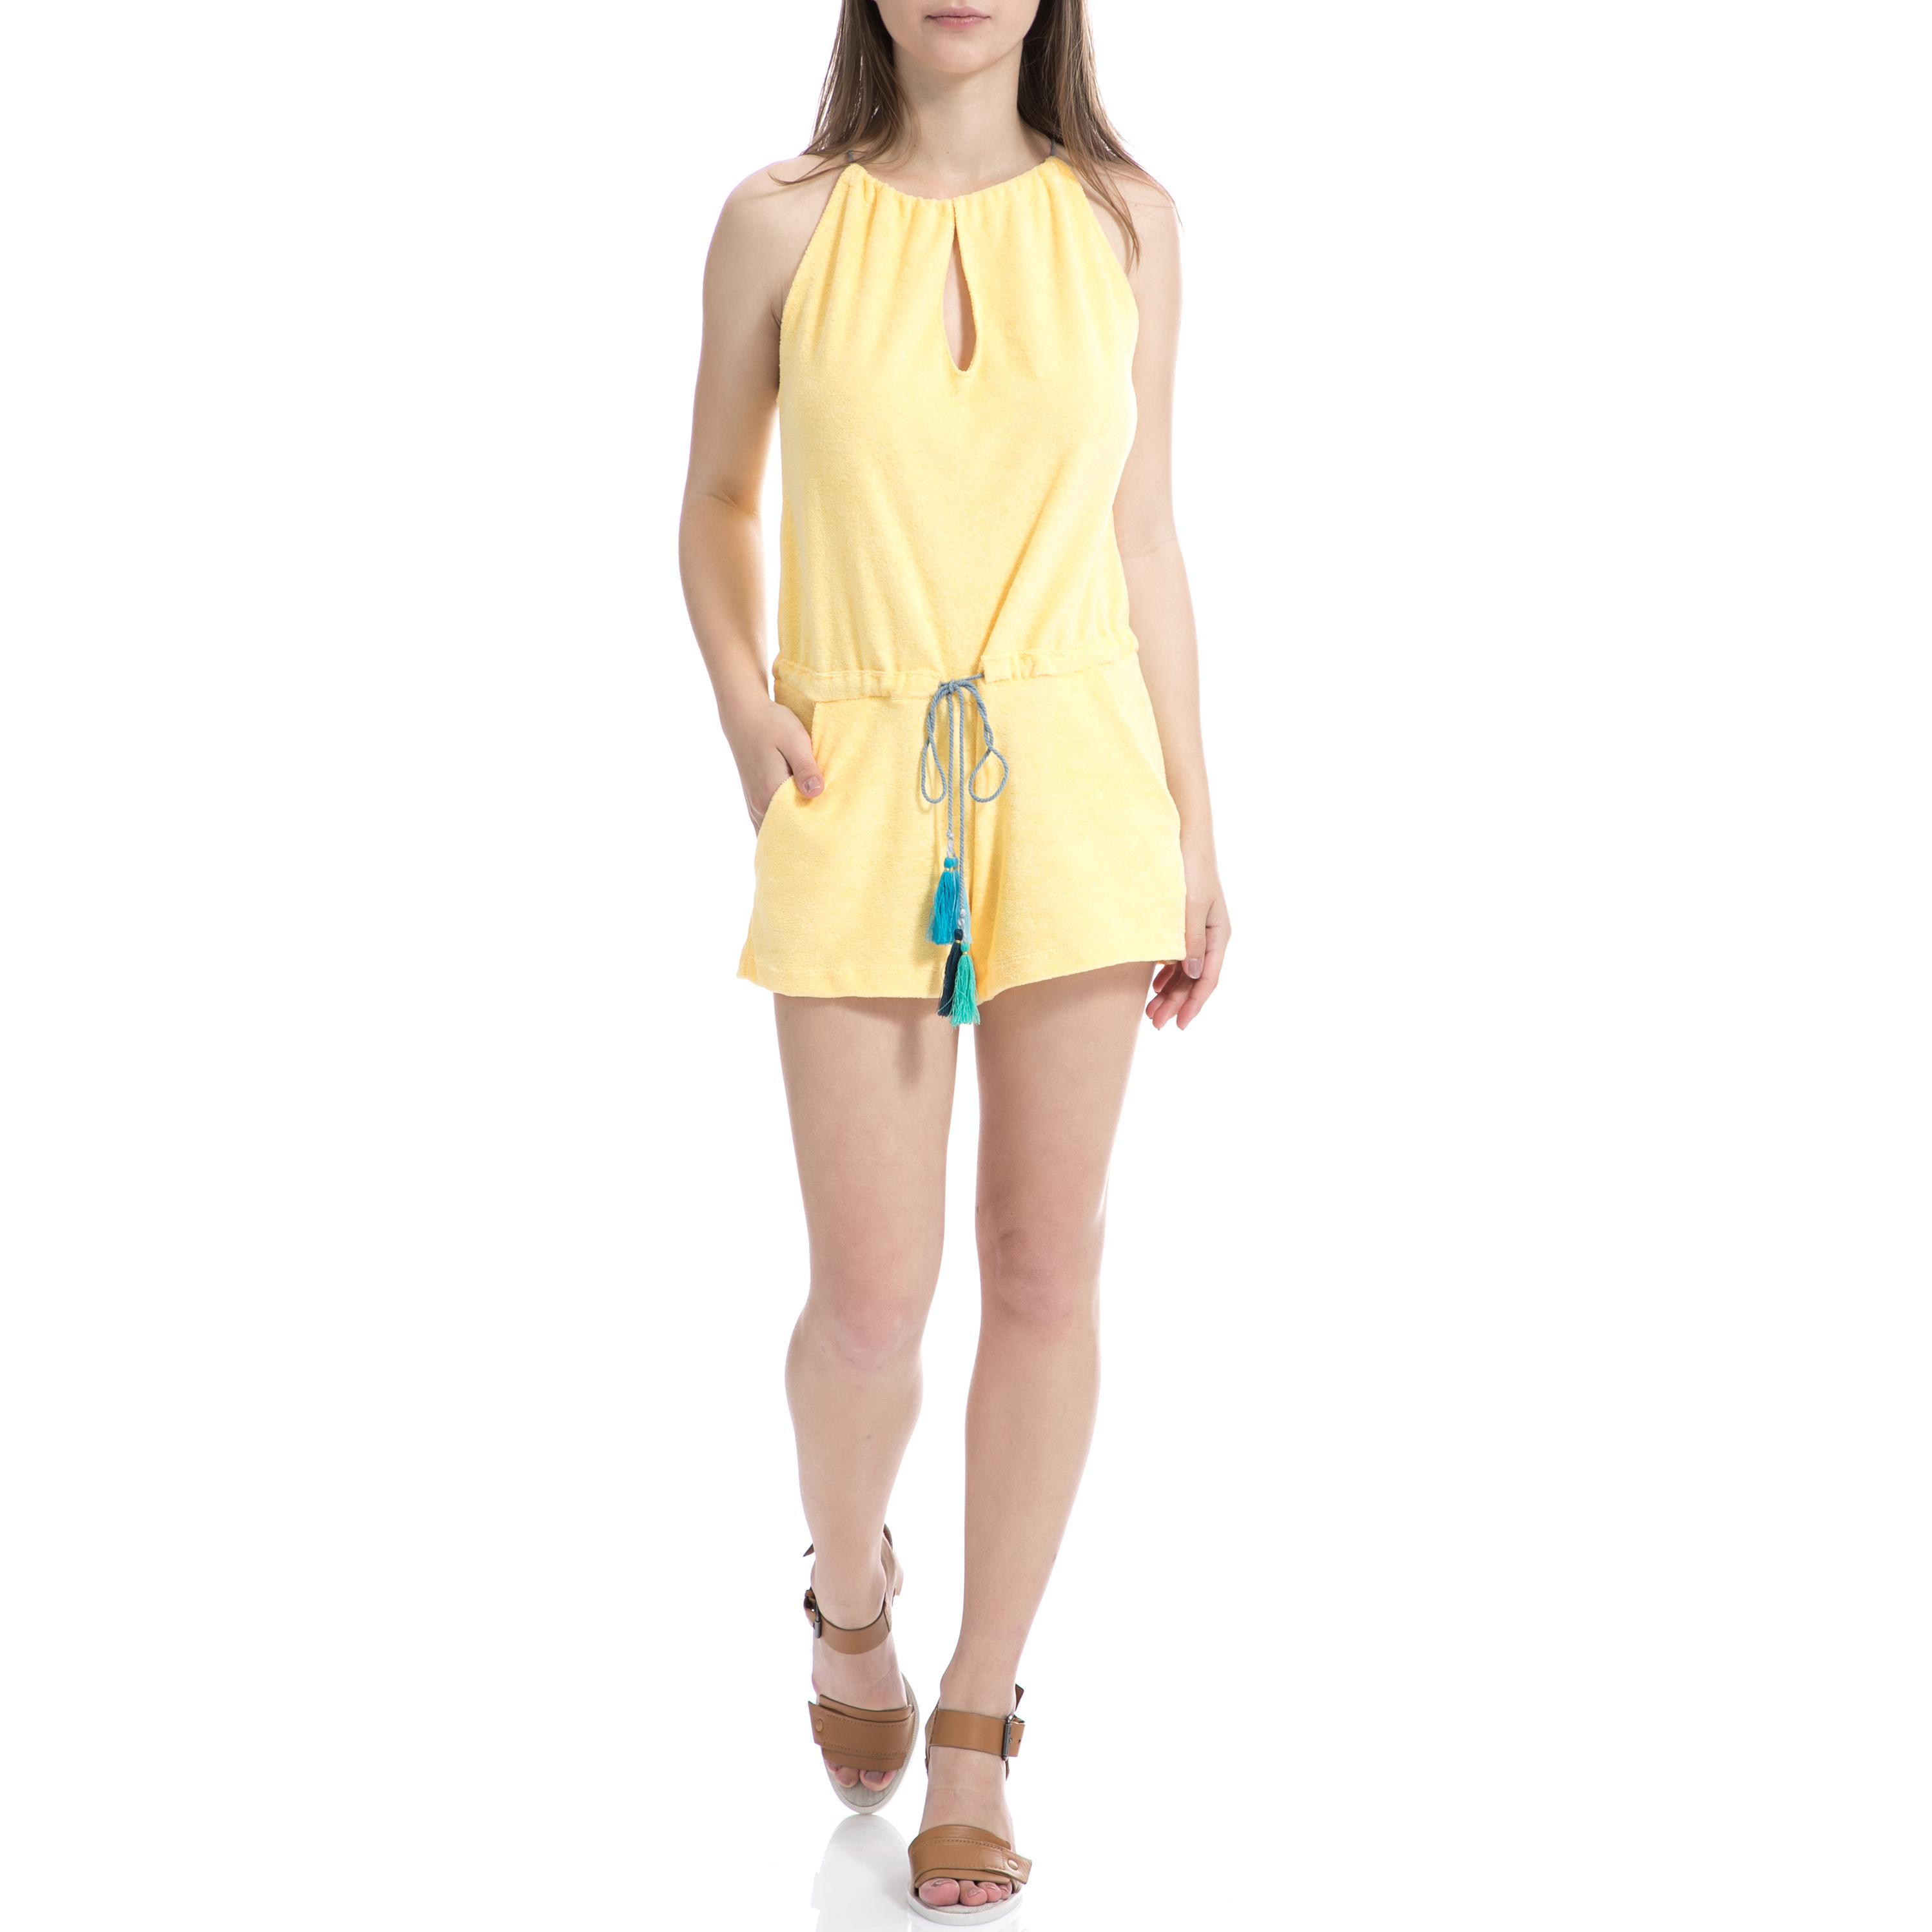 MYMOO – Γυναικεία ολόσωμη φόρμα MYMOO κίτρινη